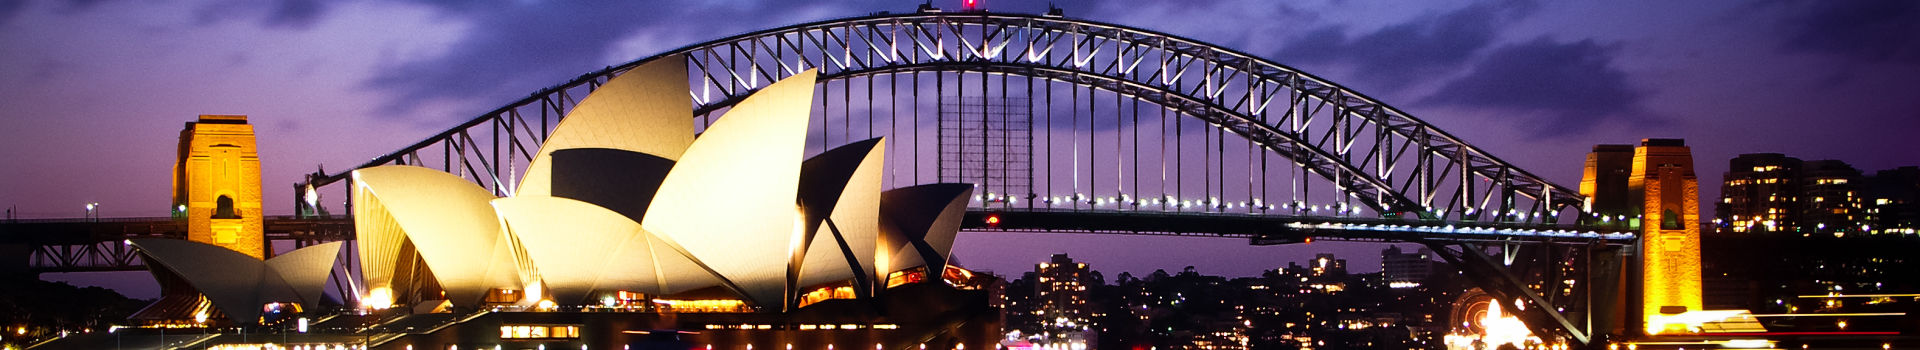 Redseason - Holidays - Sydney Australia